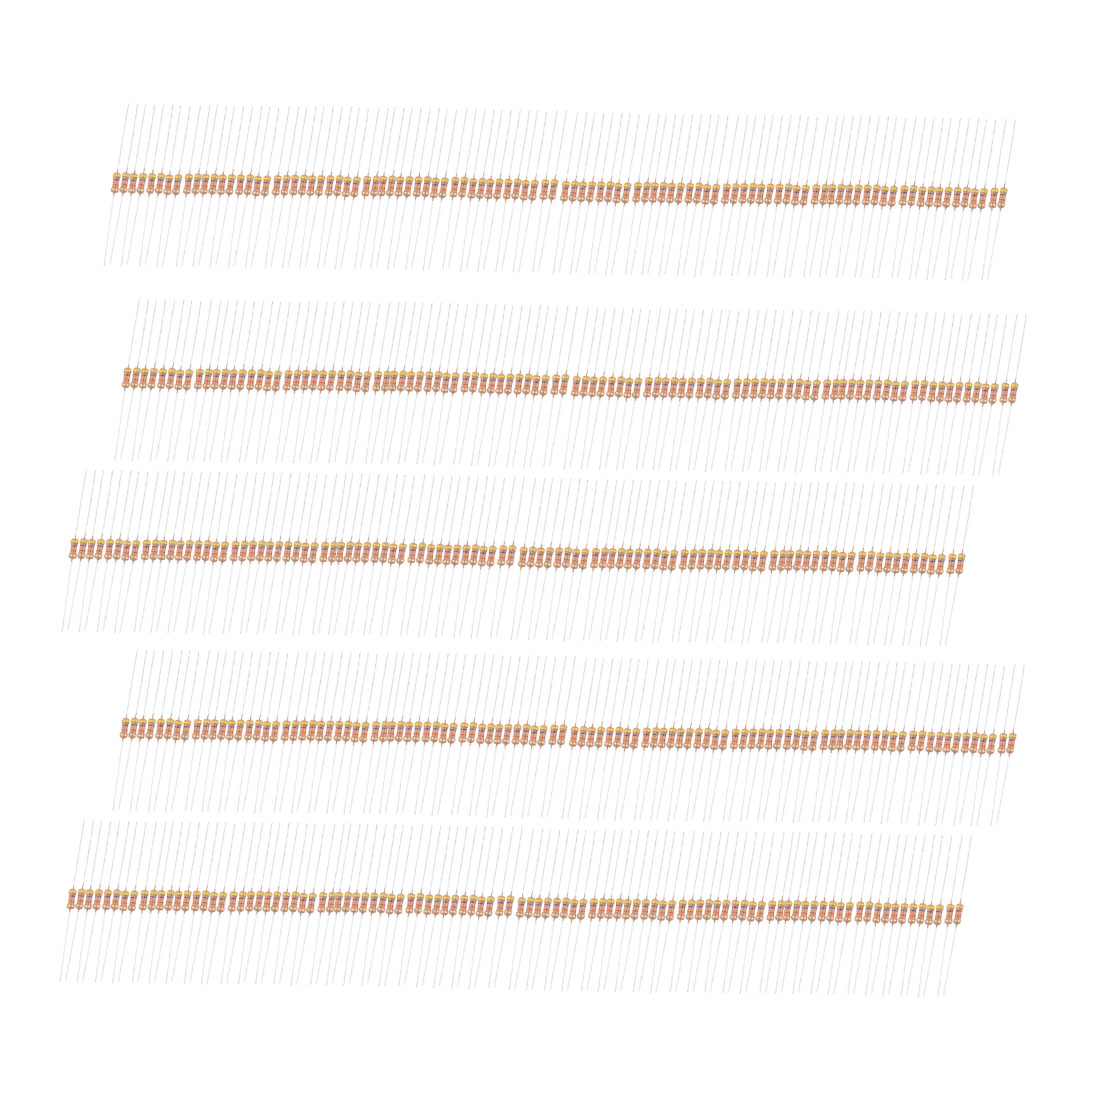 500V 1/4W 47K Ohm Metal Oxide Film Resistor 500 Pcs